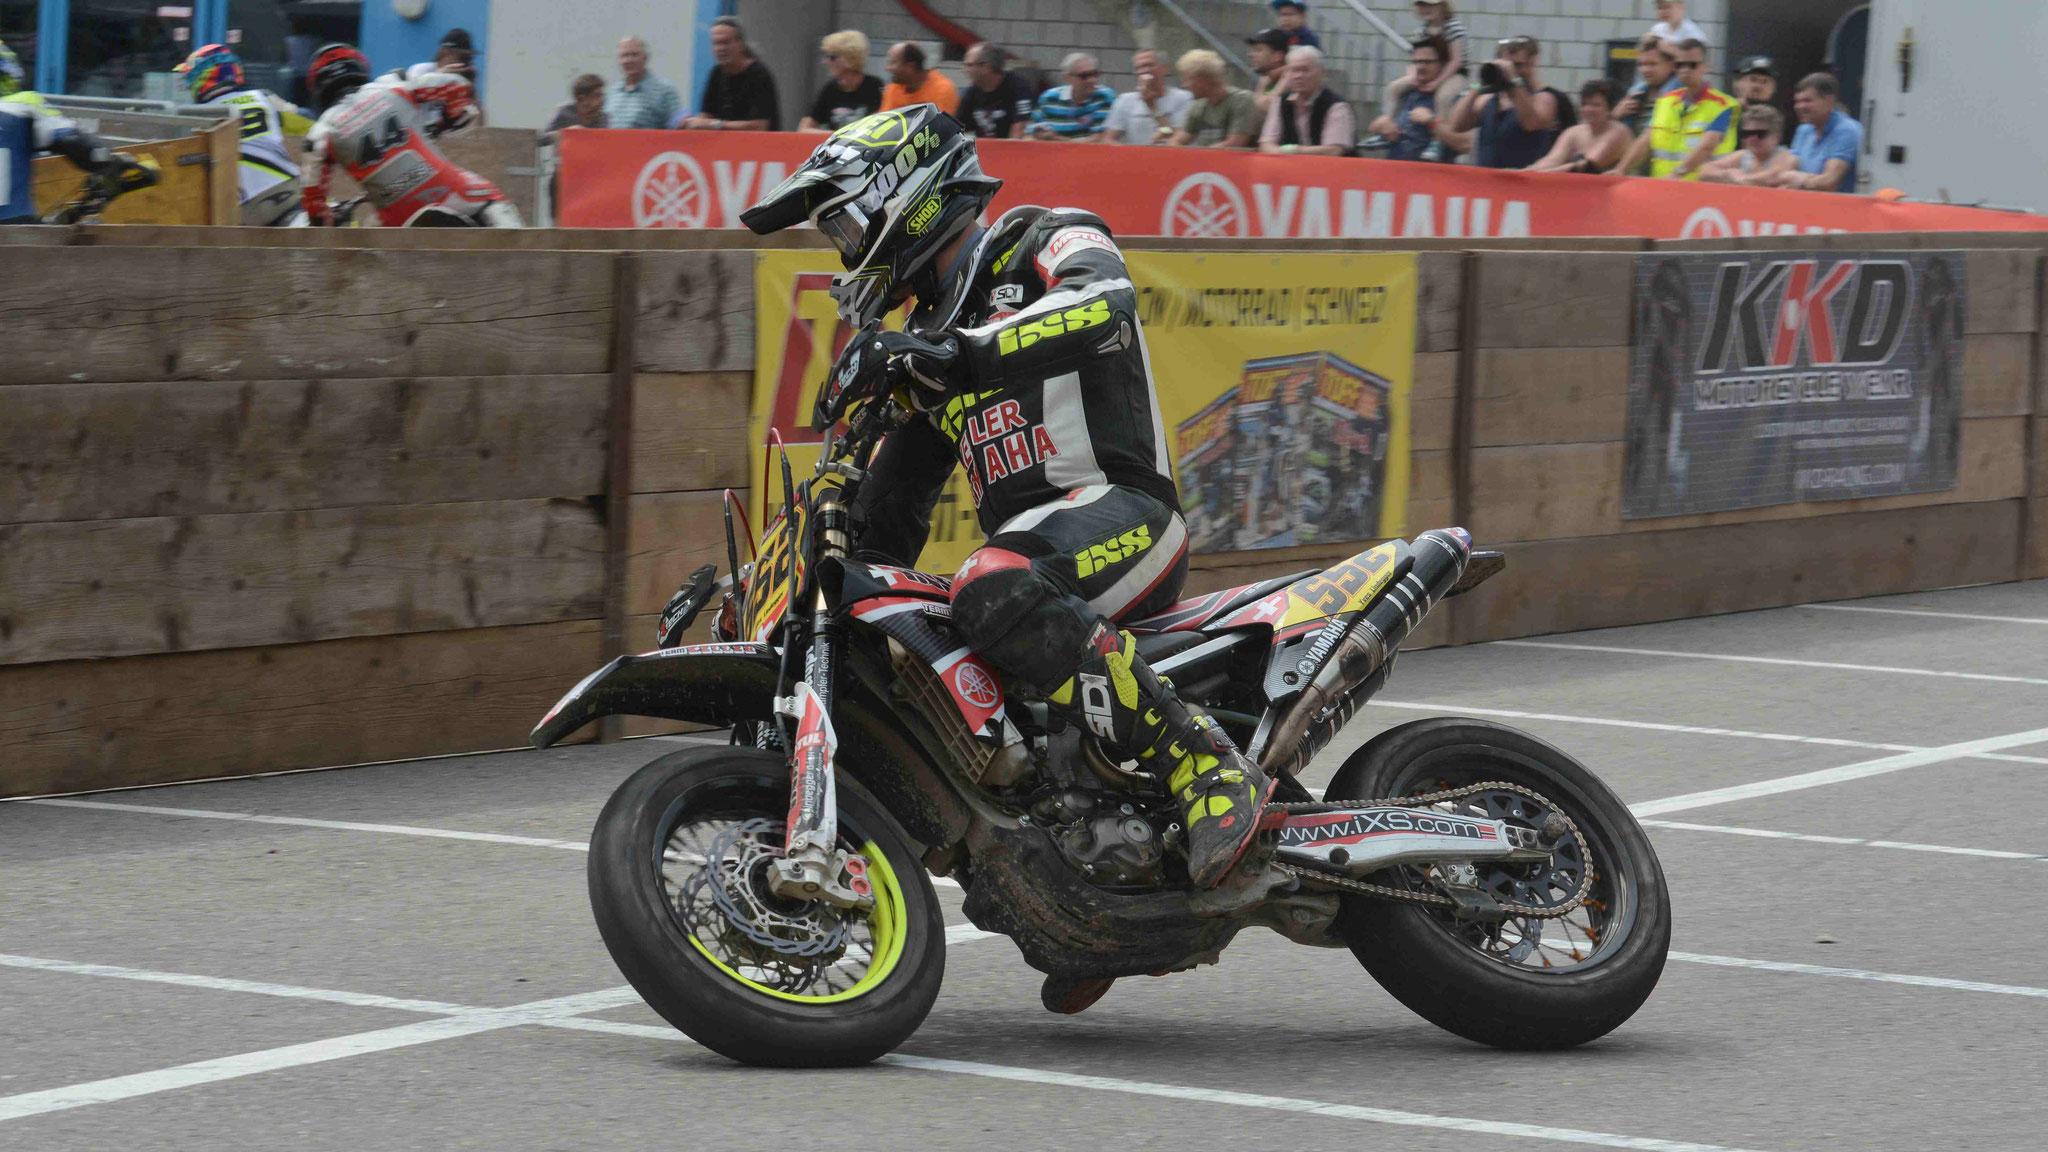 #552 Yves Lindegger - Keller Yamaha